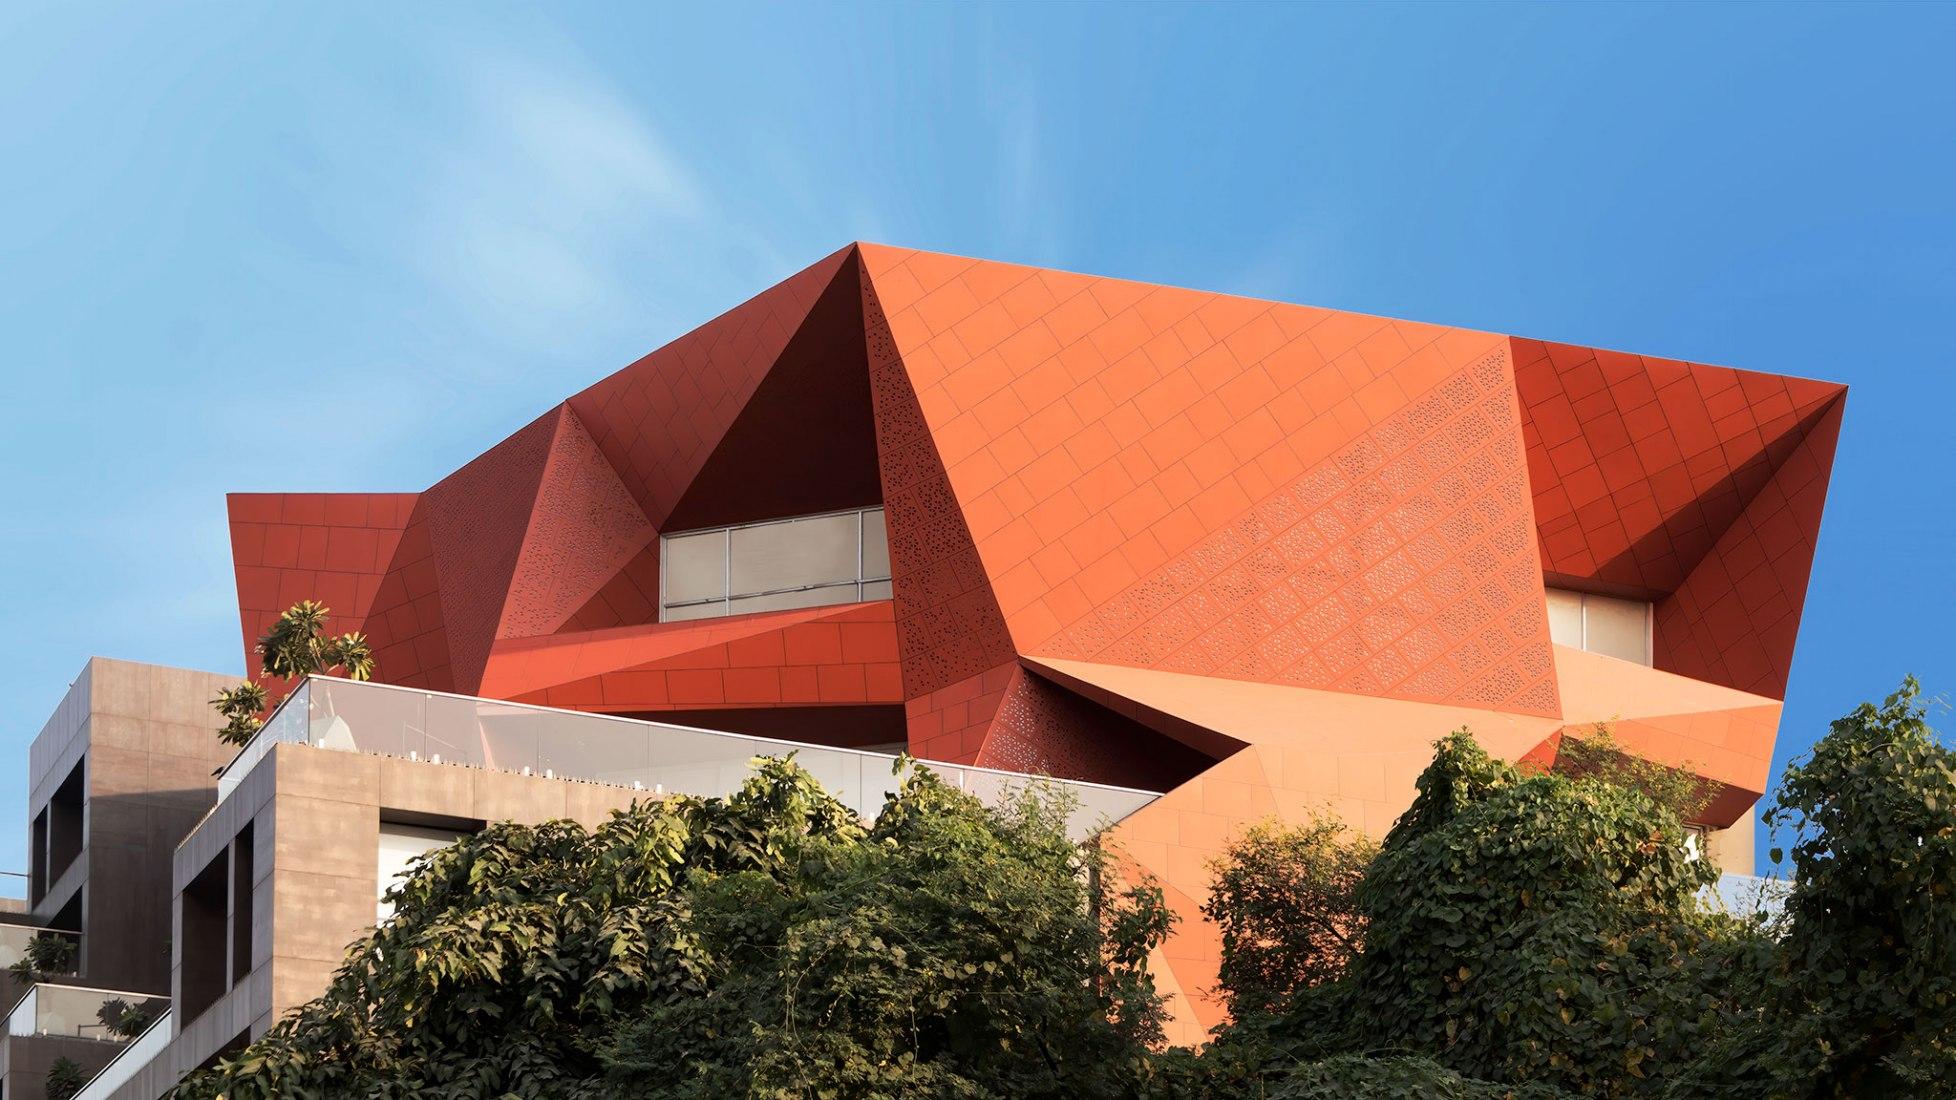 Stellar building by Sanjay Puri Architects. Photograph by Abhishek Shah